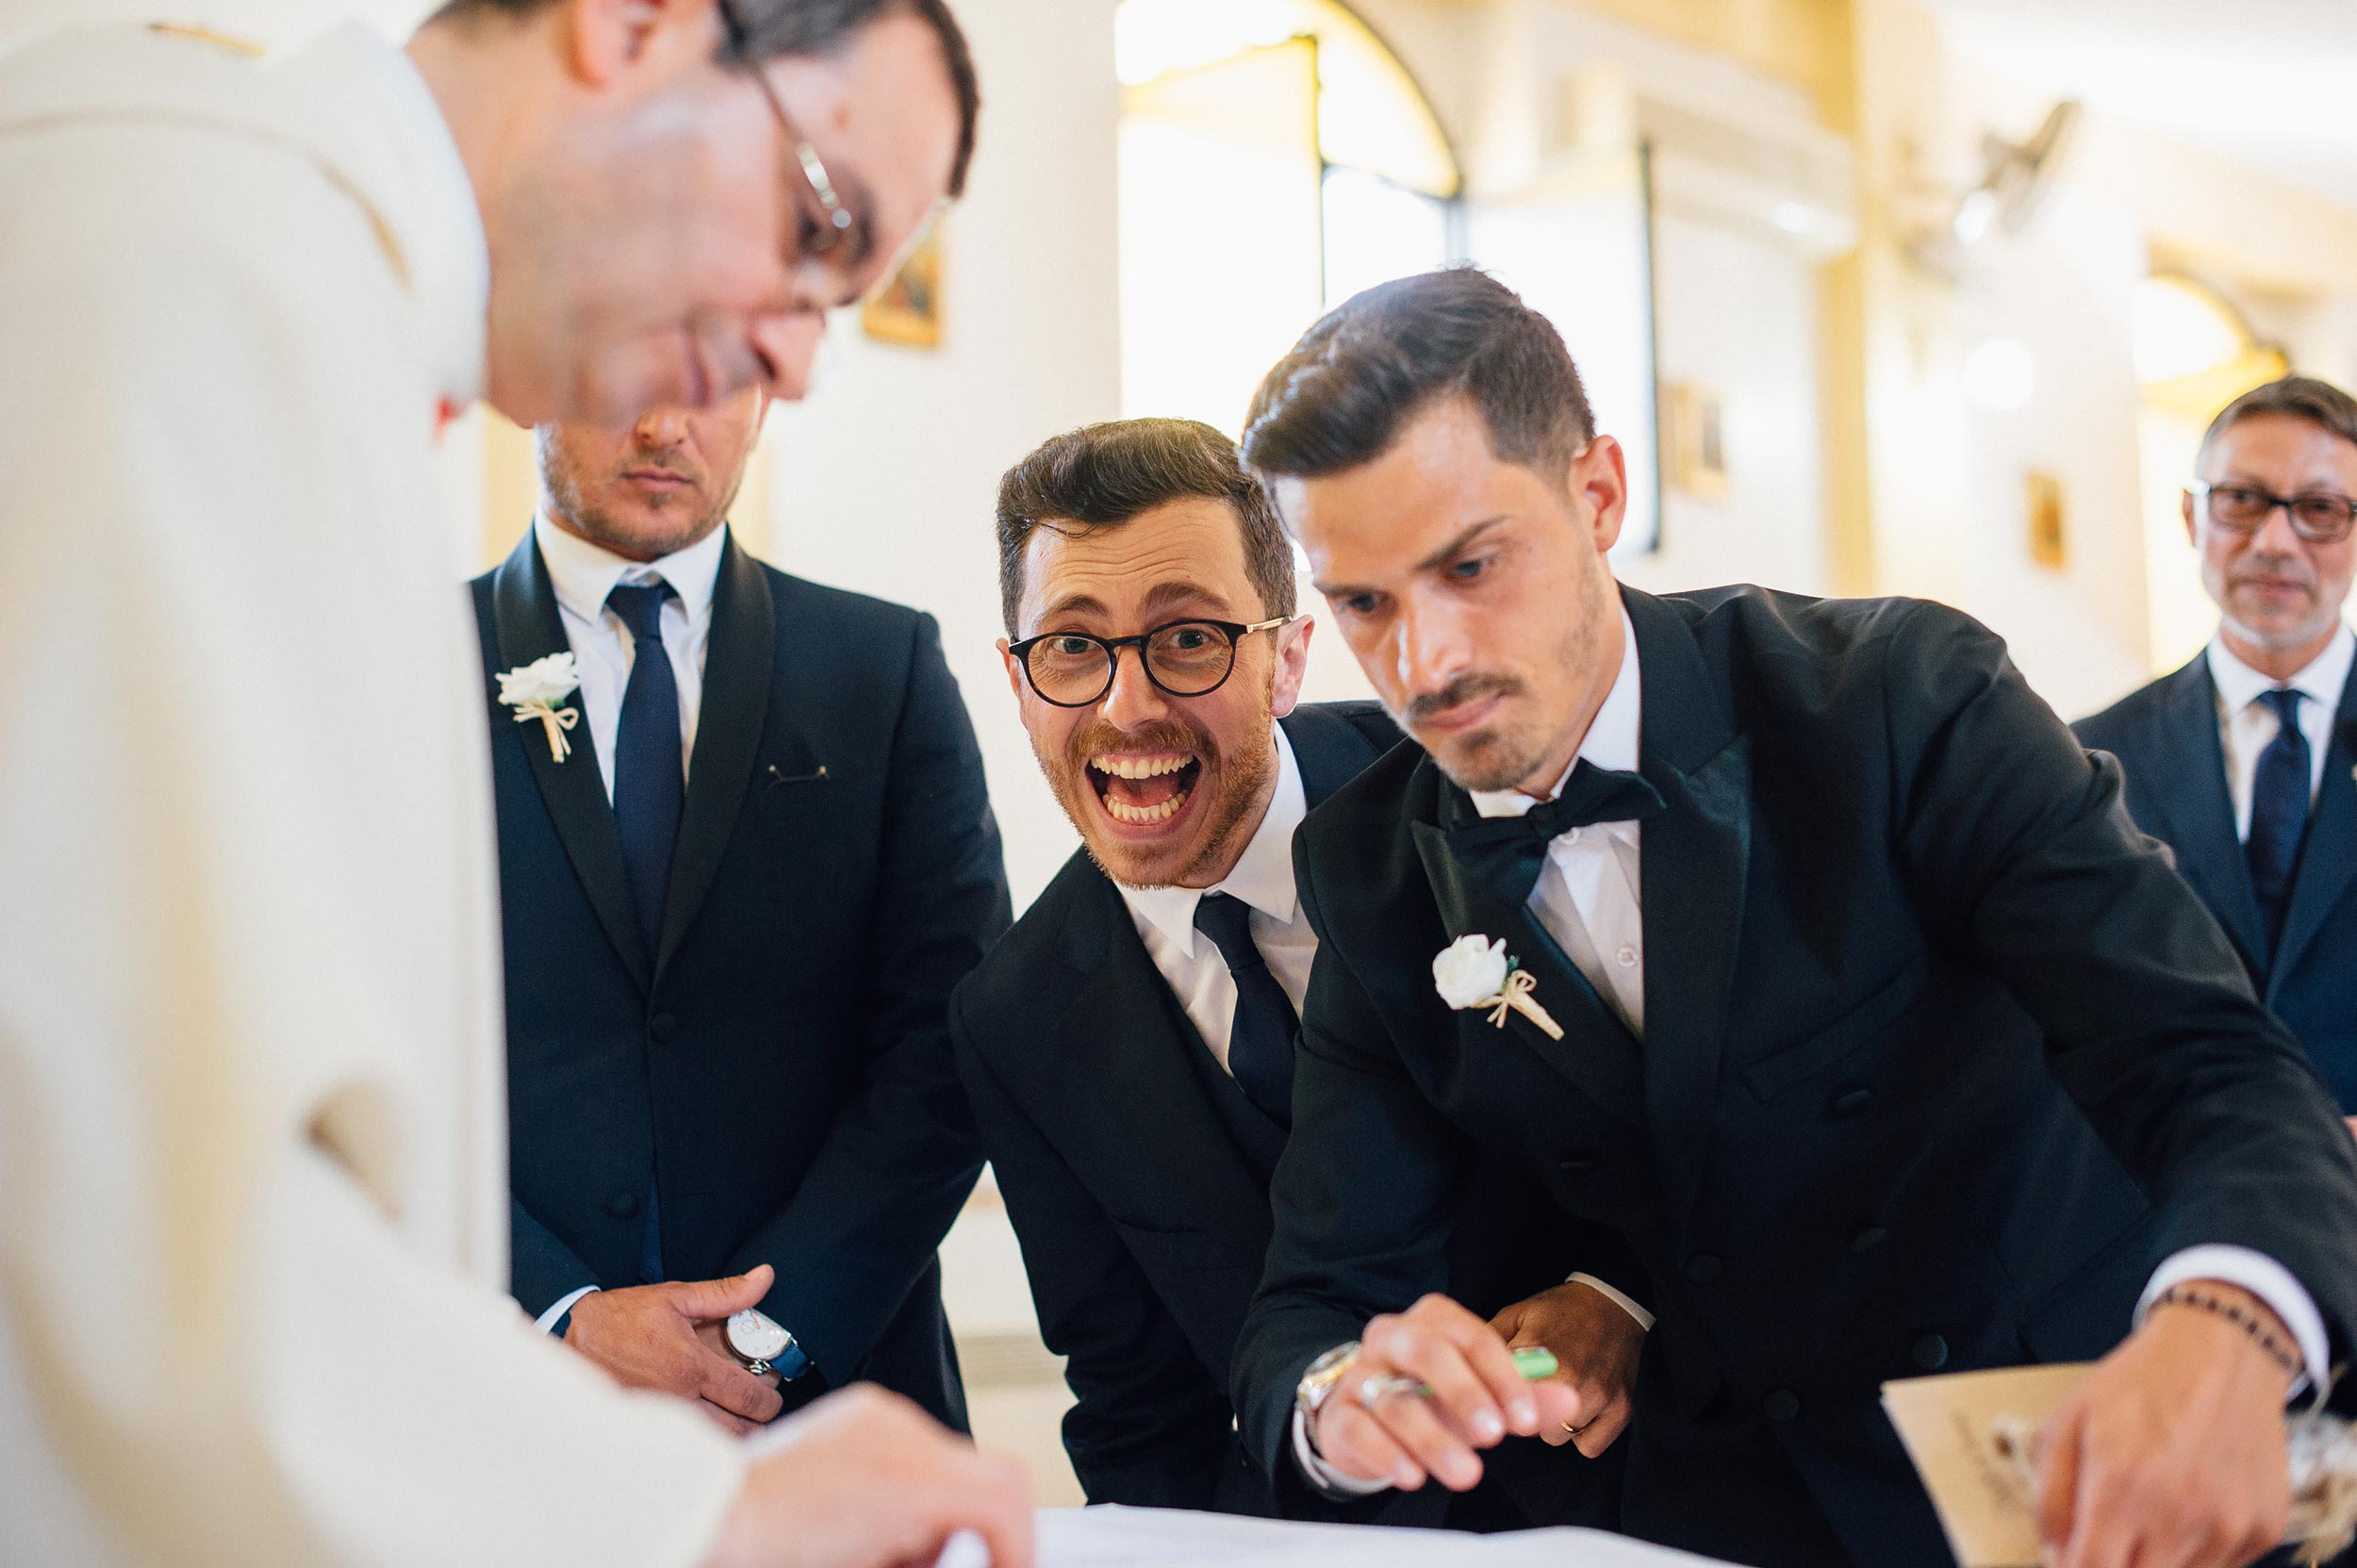 2016-Claudio-Teresa-Naples-Wedding-Photographer-Italy-Alessandro-Avenali-52.jpg